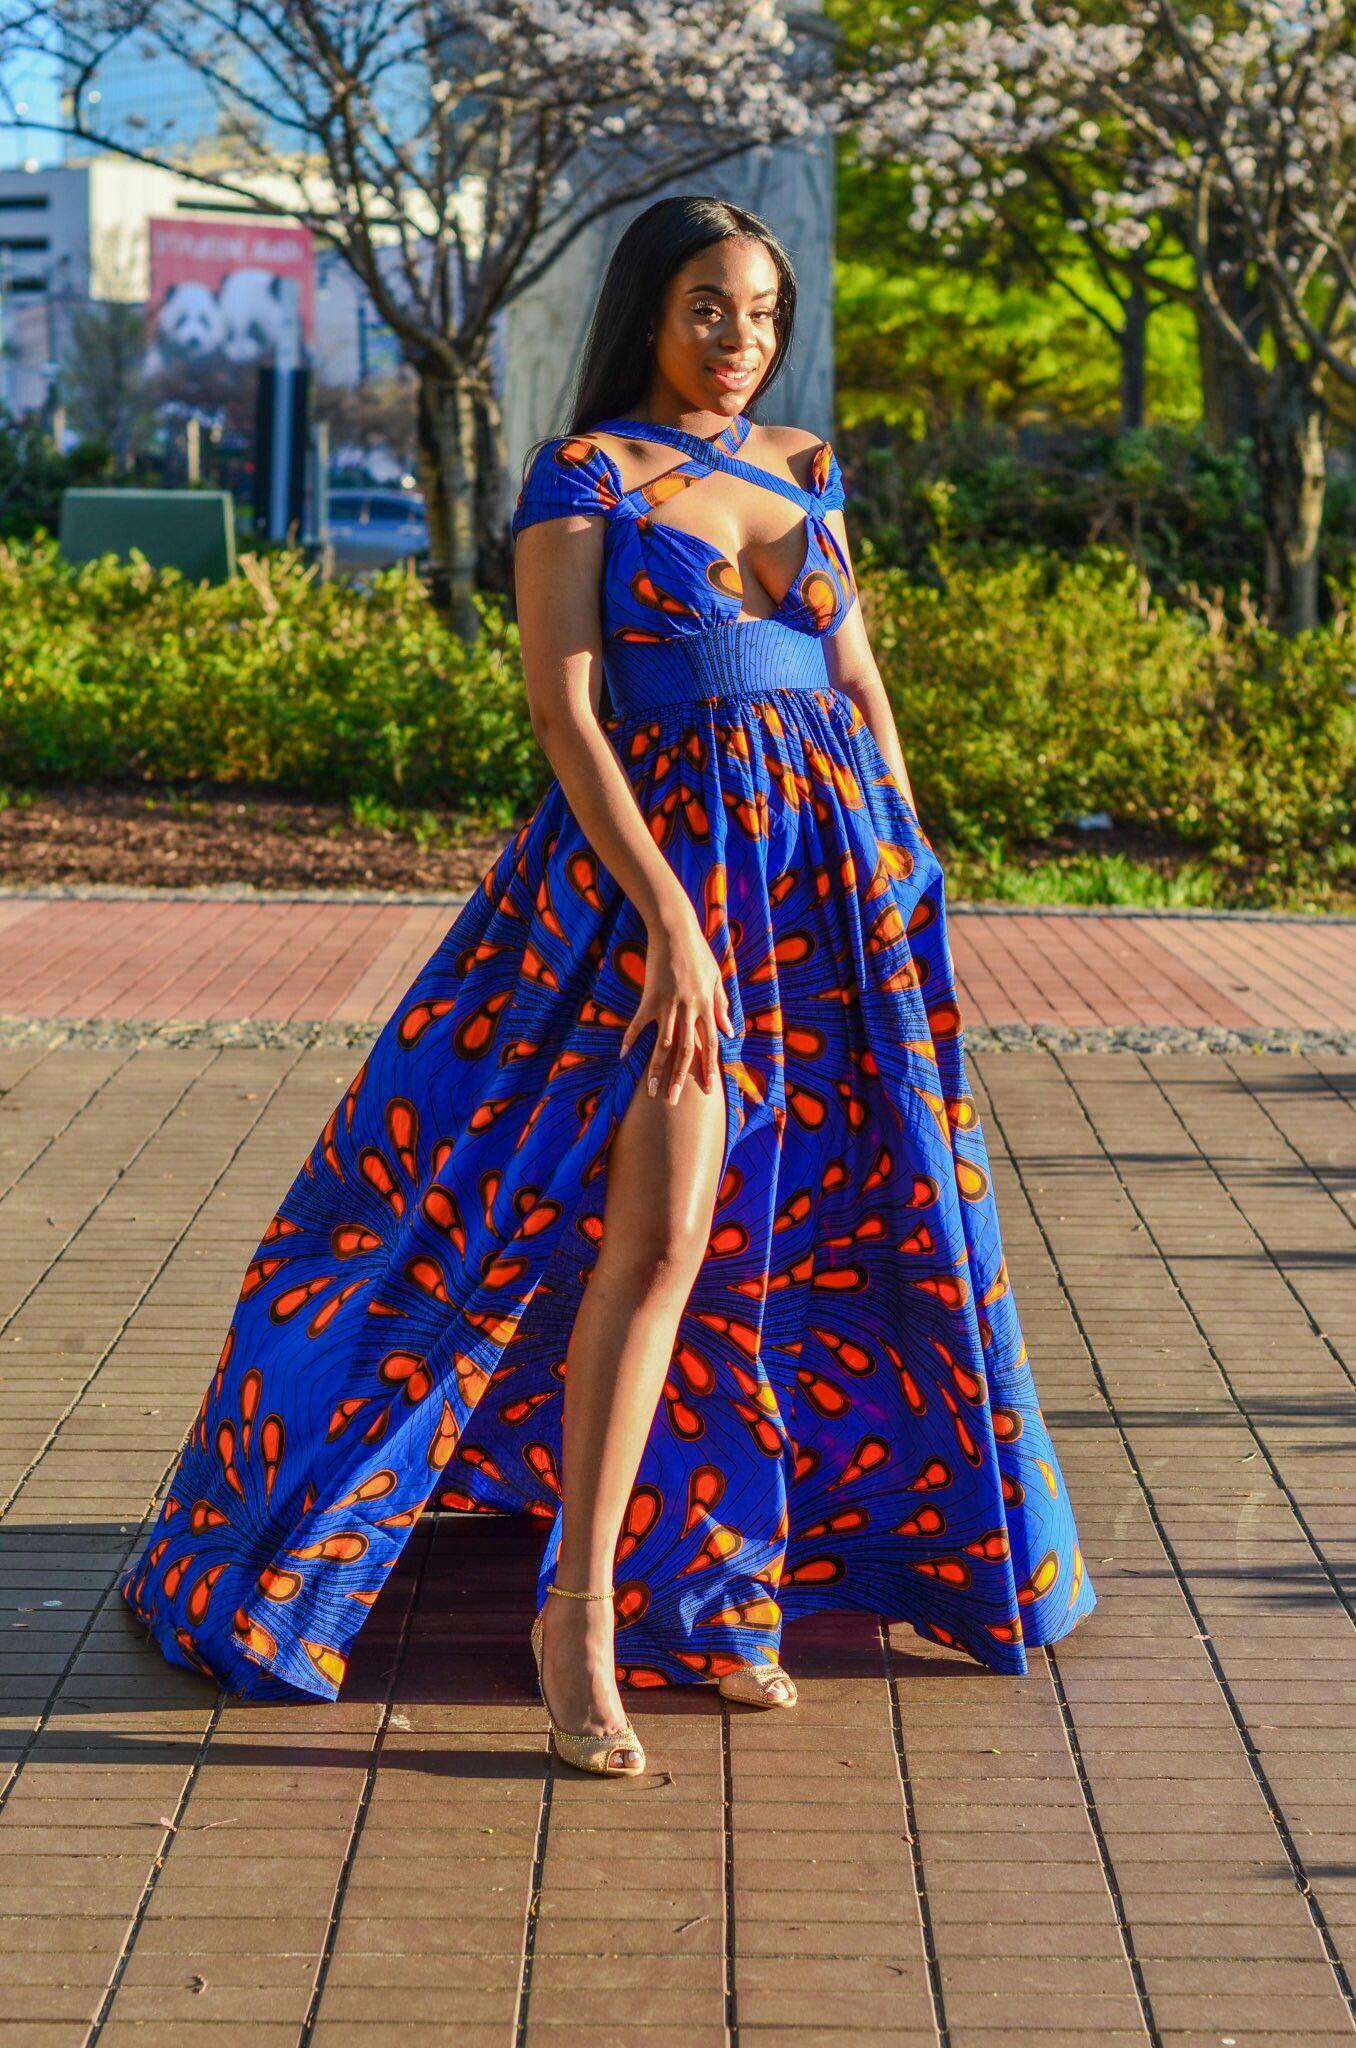 Follow for more: Nubian Princess